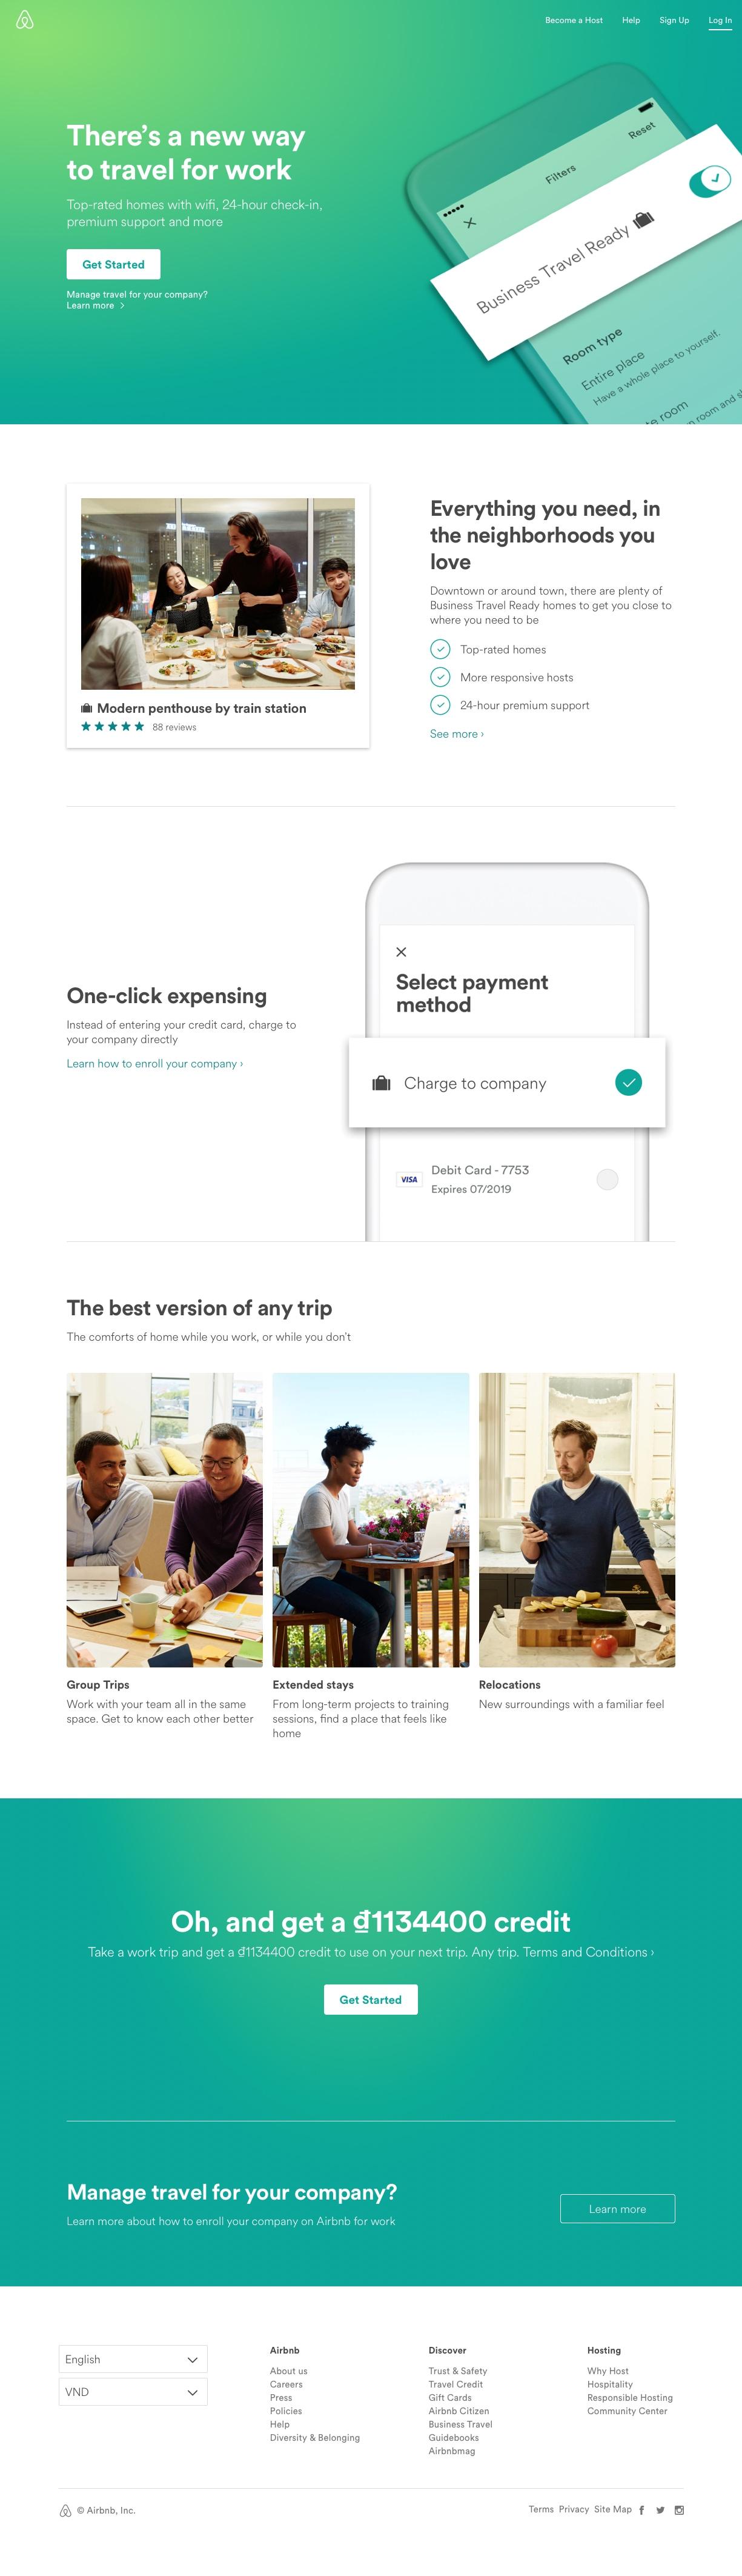 Airbnb landing page design inspiration - Lapa Ninja